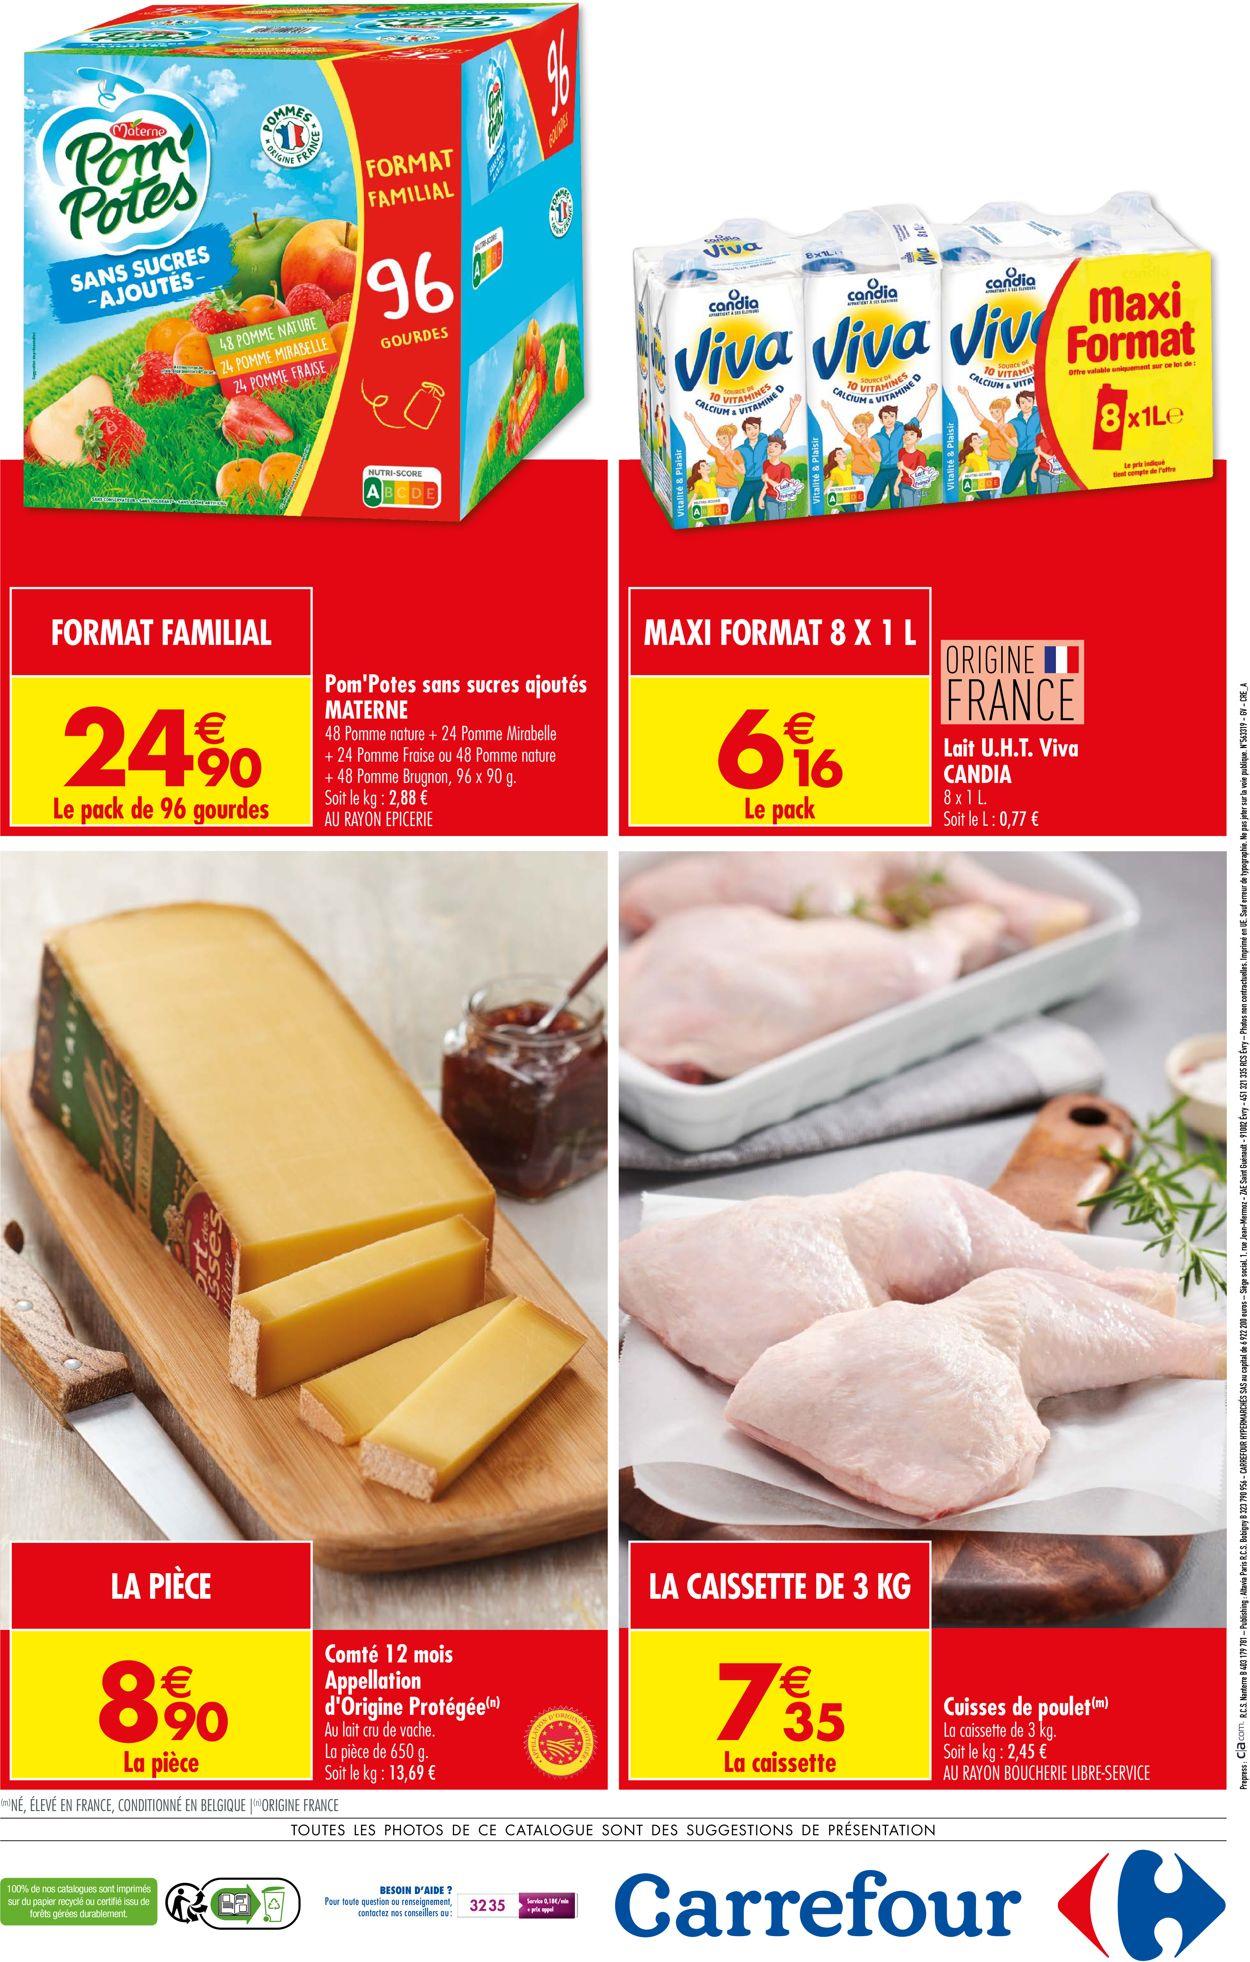 Carrefour Catalogue - 12.11-25.11.2019 (Page 16)